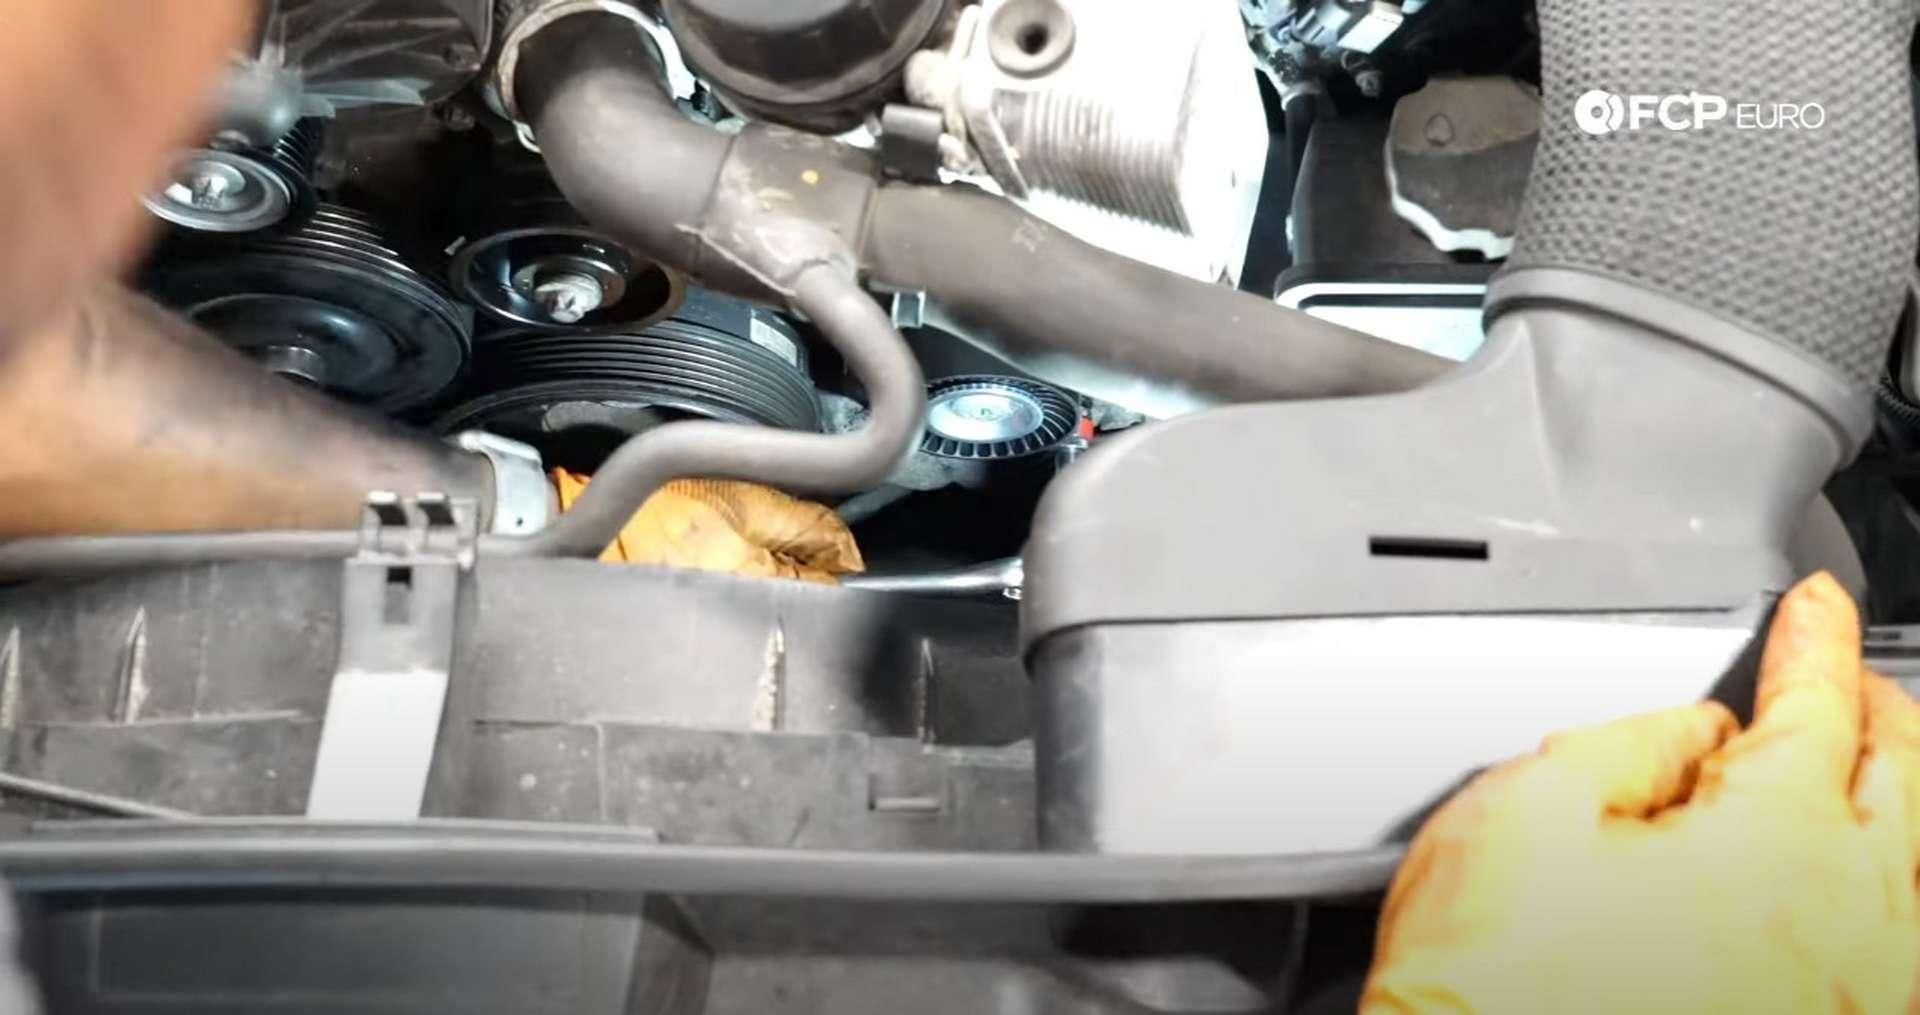 DIY Mercedes W212/204 Alternator and Drive Belt Replacement installing the belt tensioner]